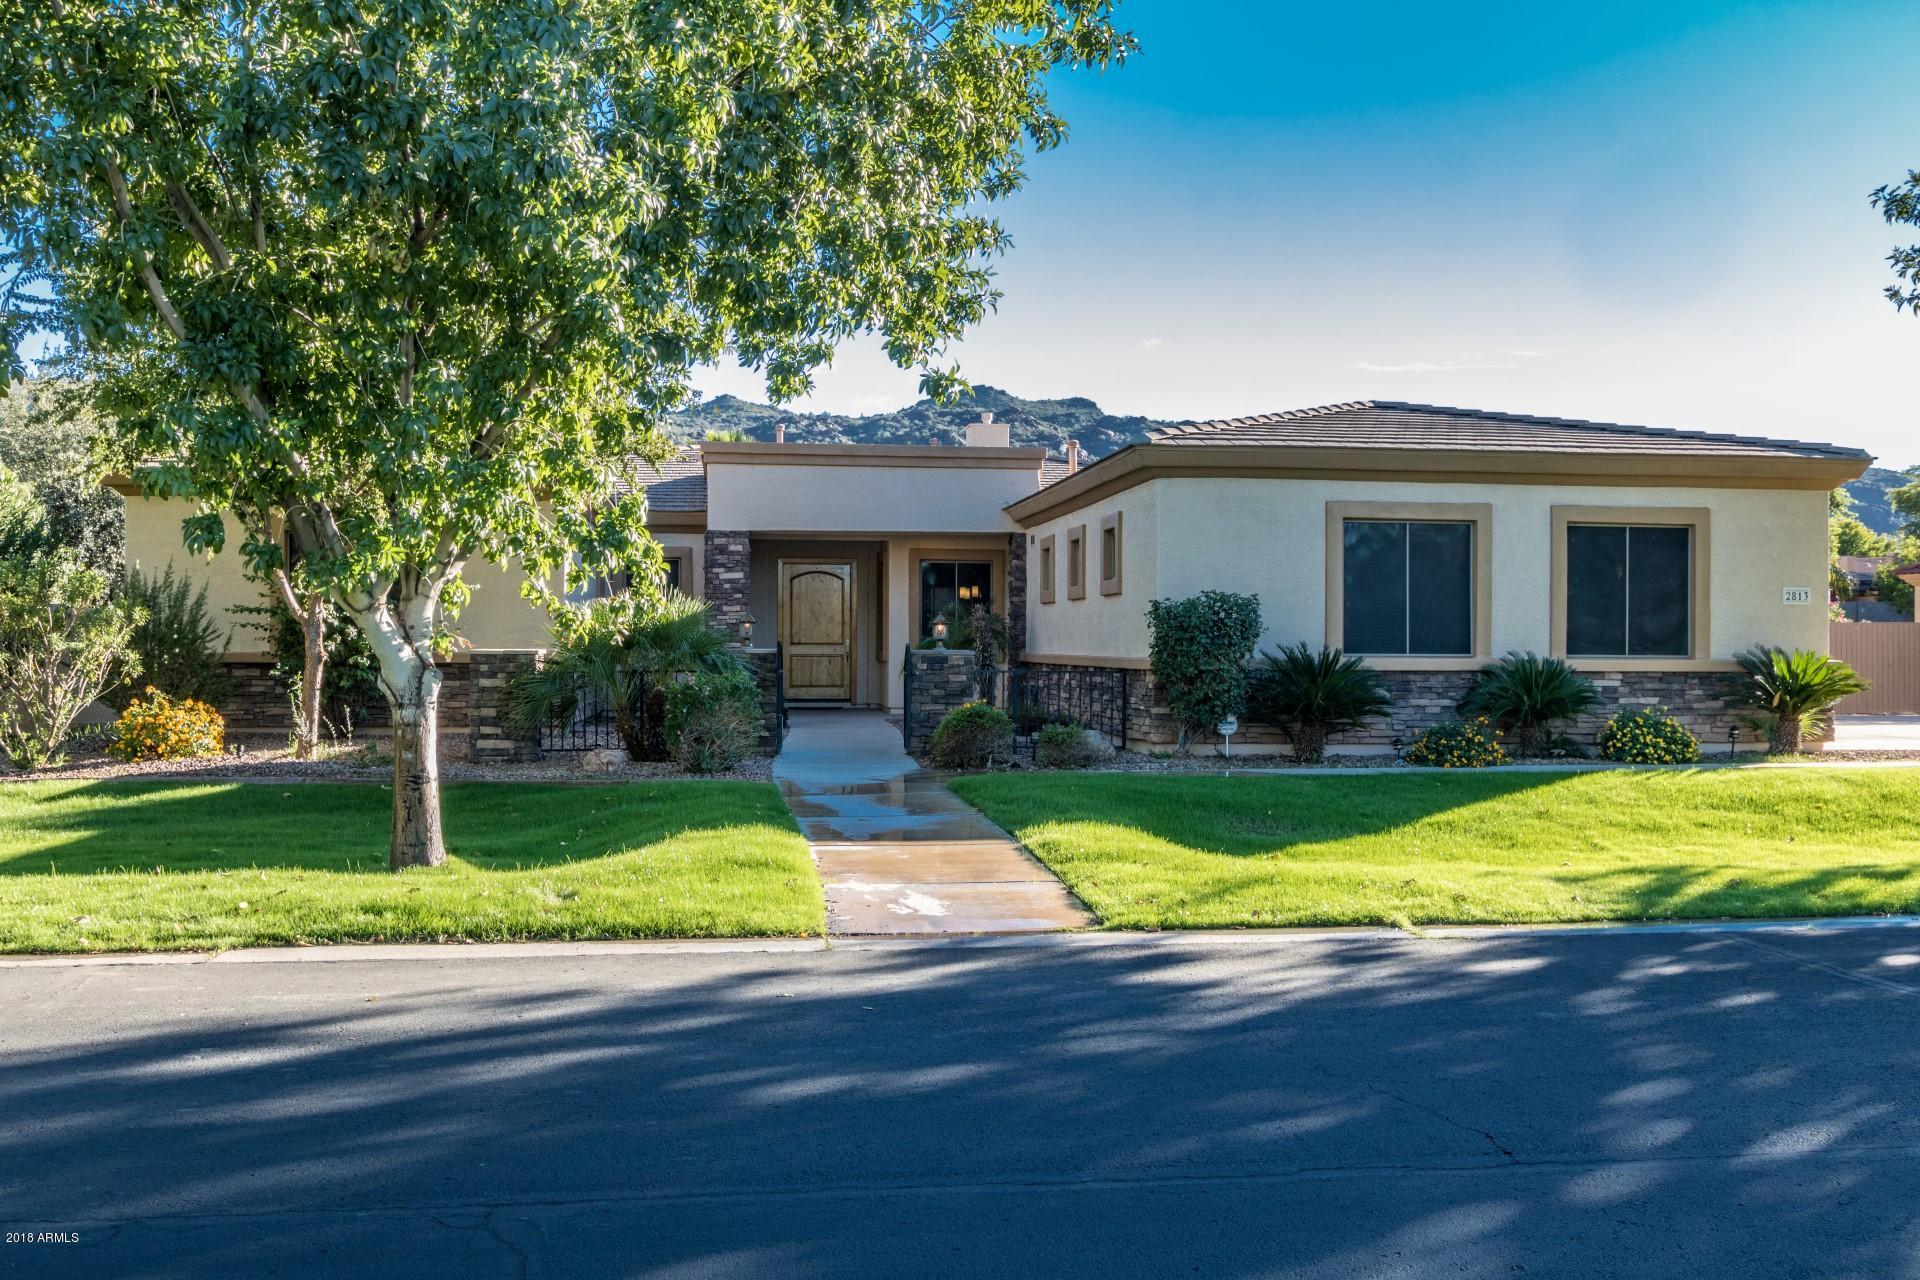 Photo of 2813 E GARY Way, Phoenix, AZ 85042